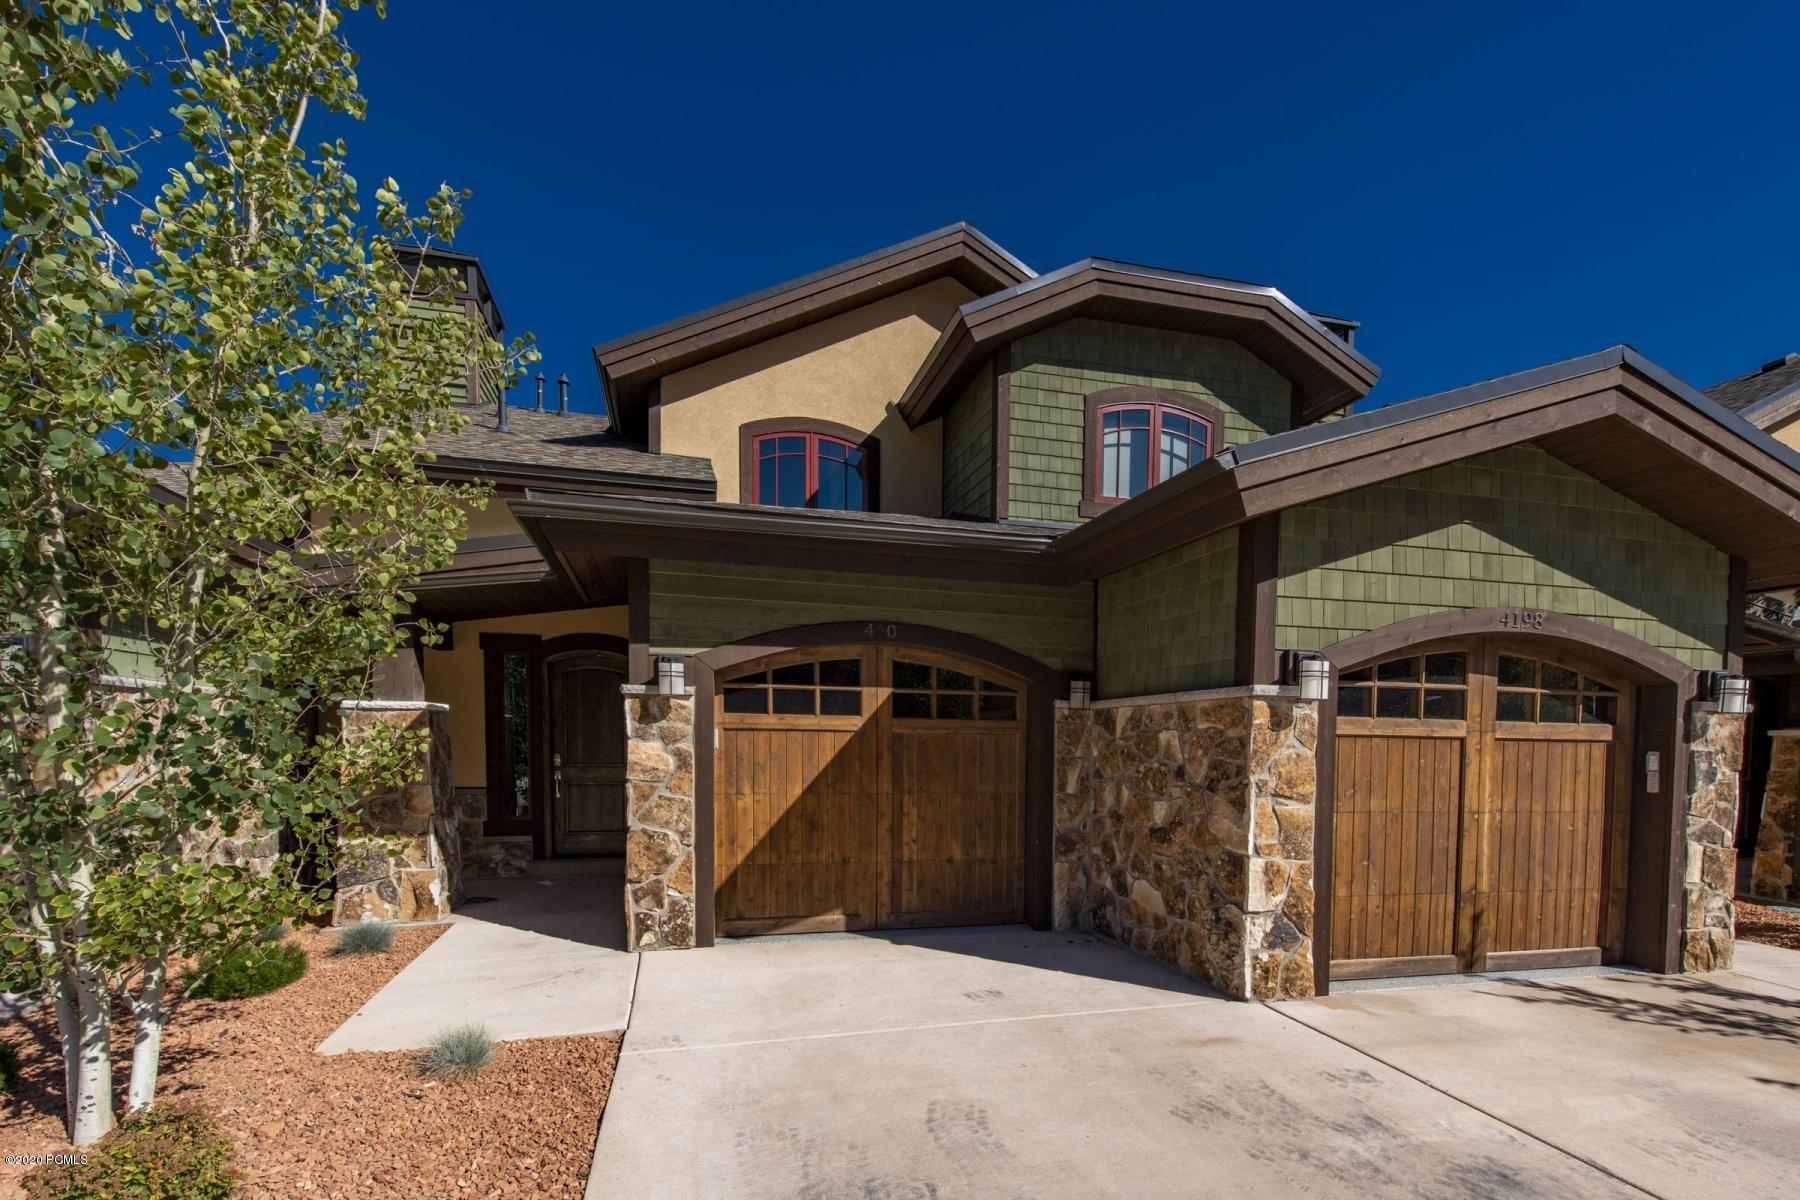 4156 Fairway Lane, Park City, Utah 84098, 3 Bedrooms Bedrooms, ,3 BathroomsBathrooms,Condominium,For Sale,Fairway,11907784